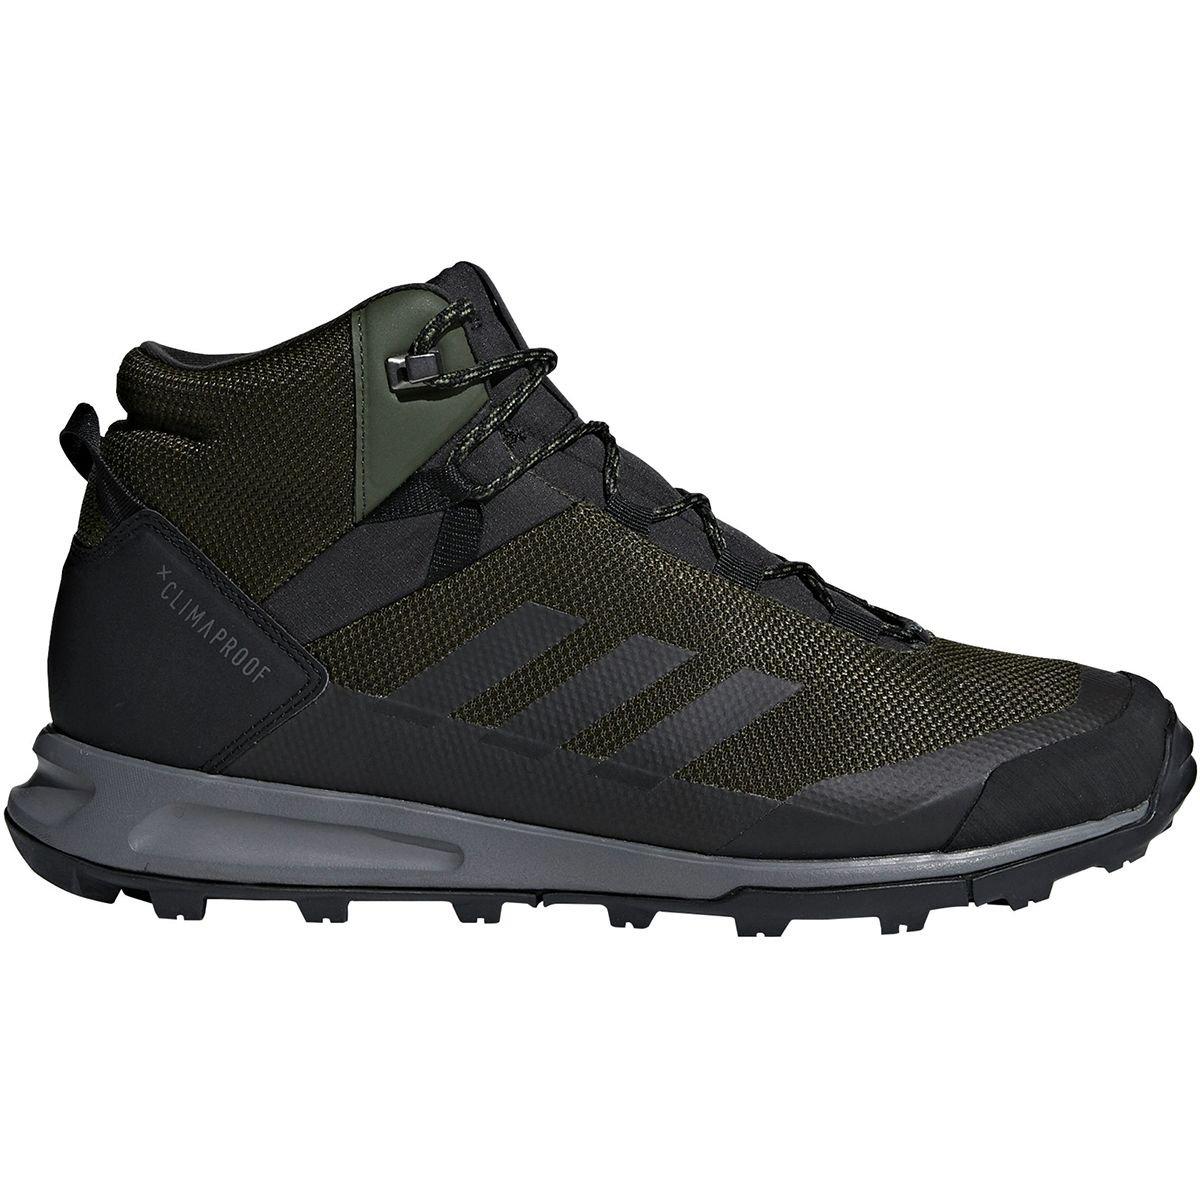 adidas outdoor Men's Terrex Tivid Mid Cp Walking Shoe B078WG6ZJ4 13 D(M) US|Night Cargo/Black/Grey Four